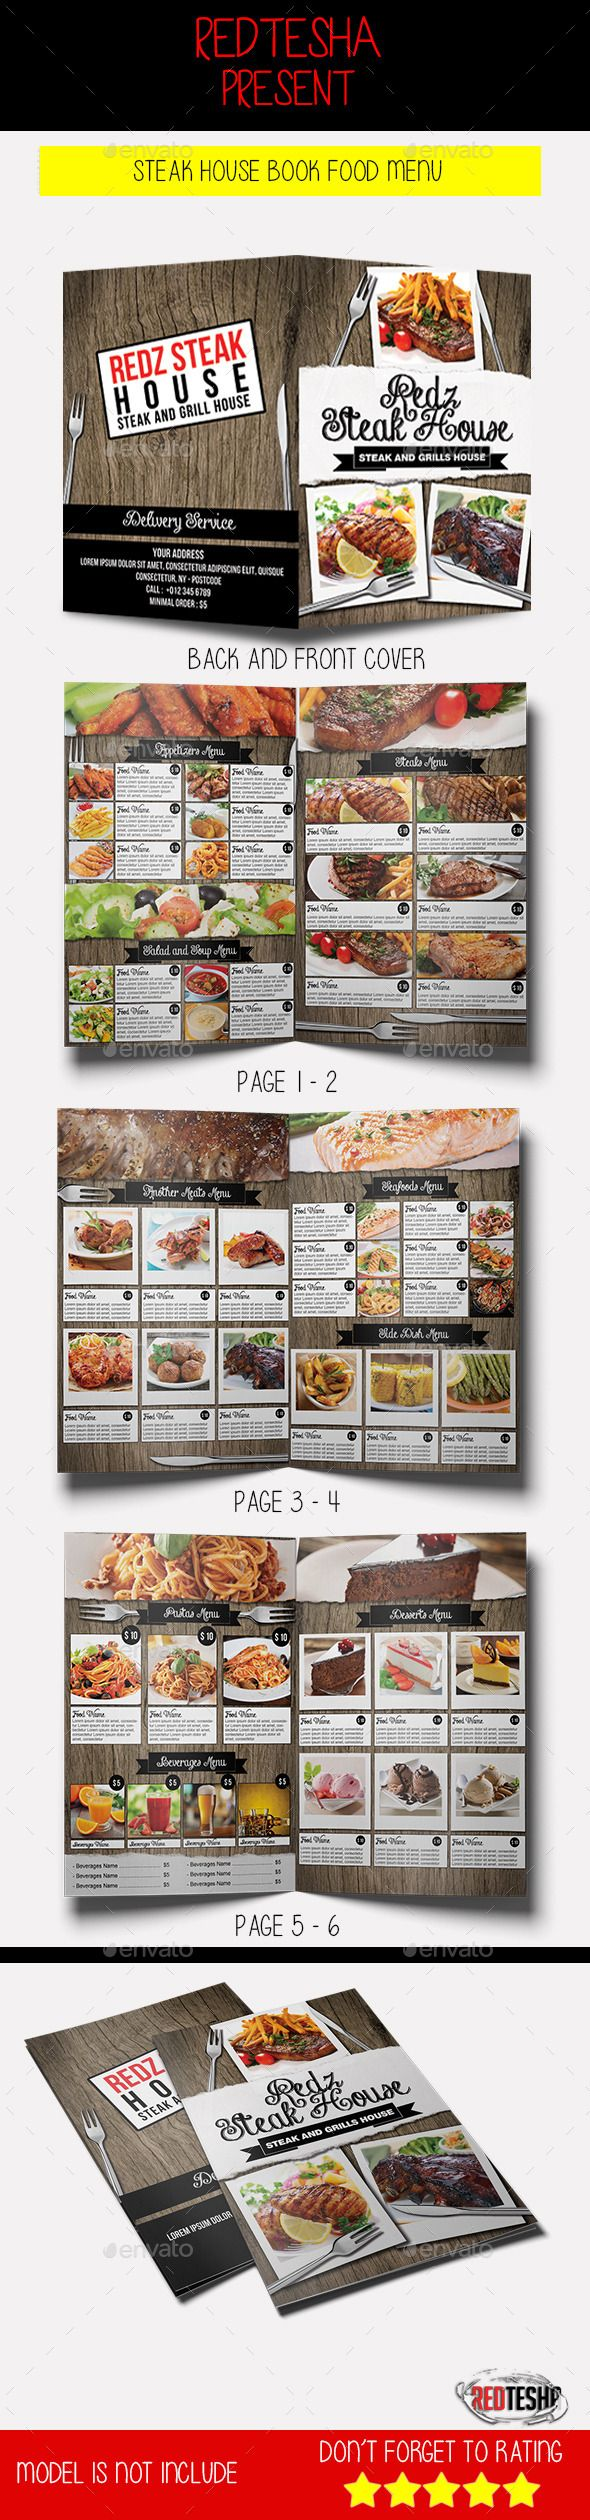 White apron menu warrington - Steak House Book Food Menu